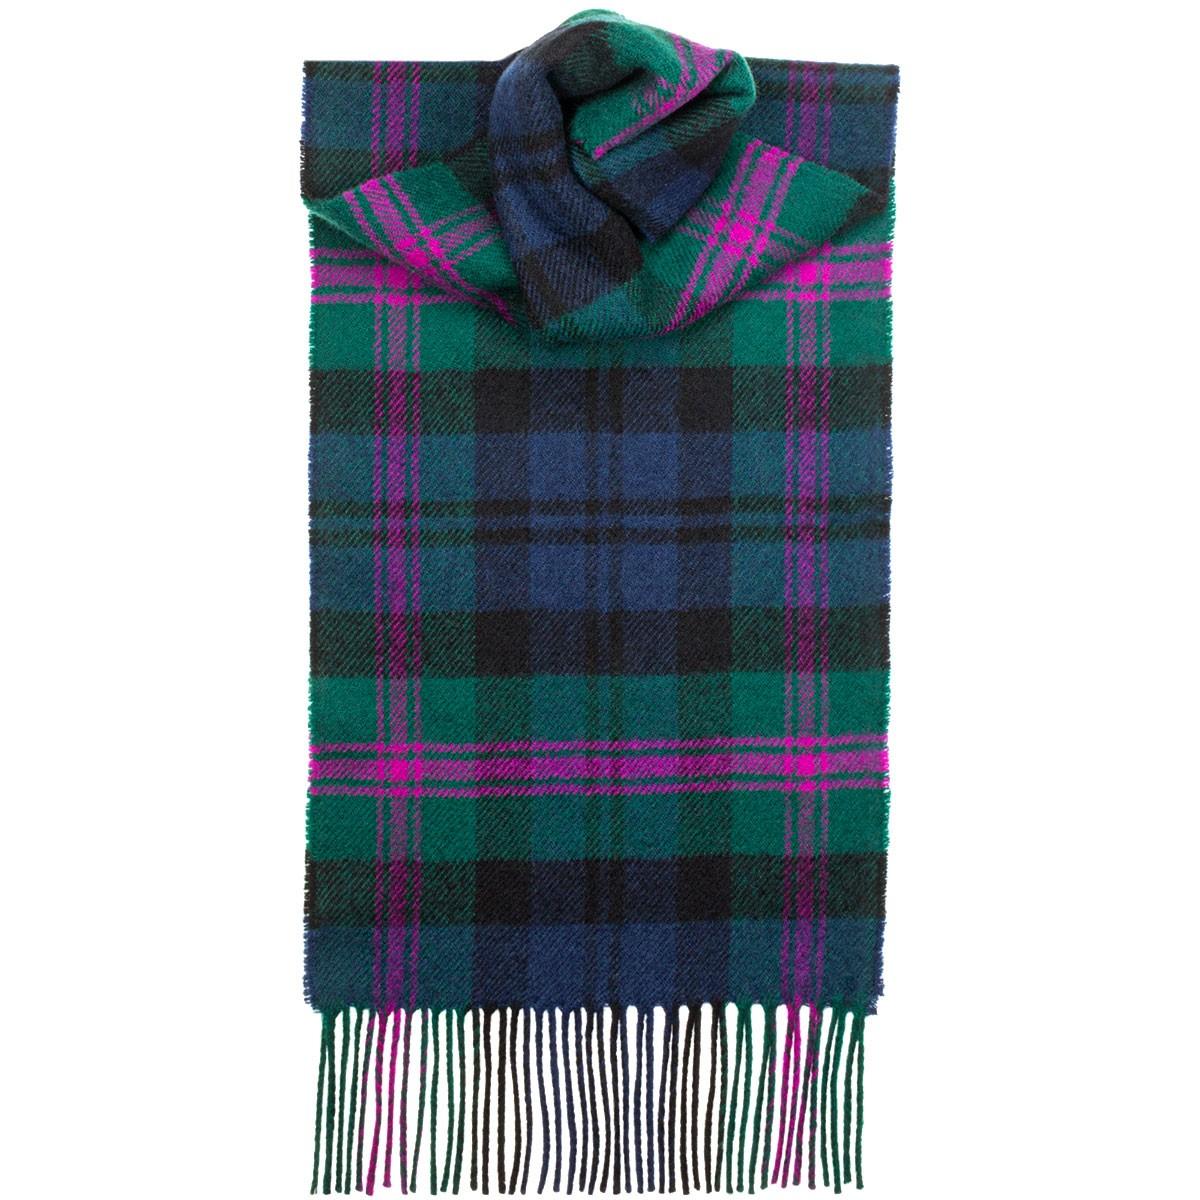 Tartan Scarves baird modern tartan lambswool scarf IAZPEBE